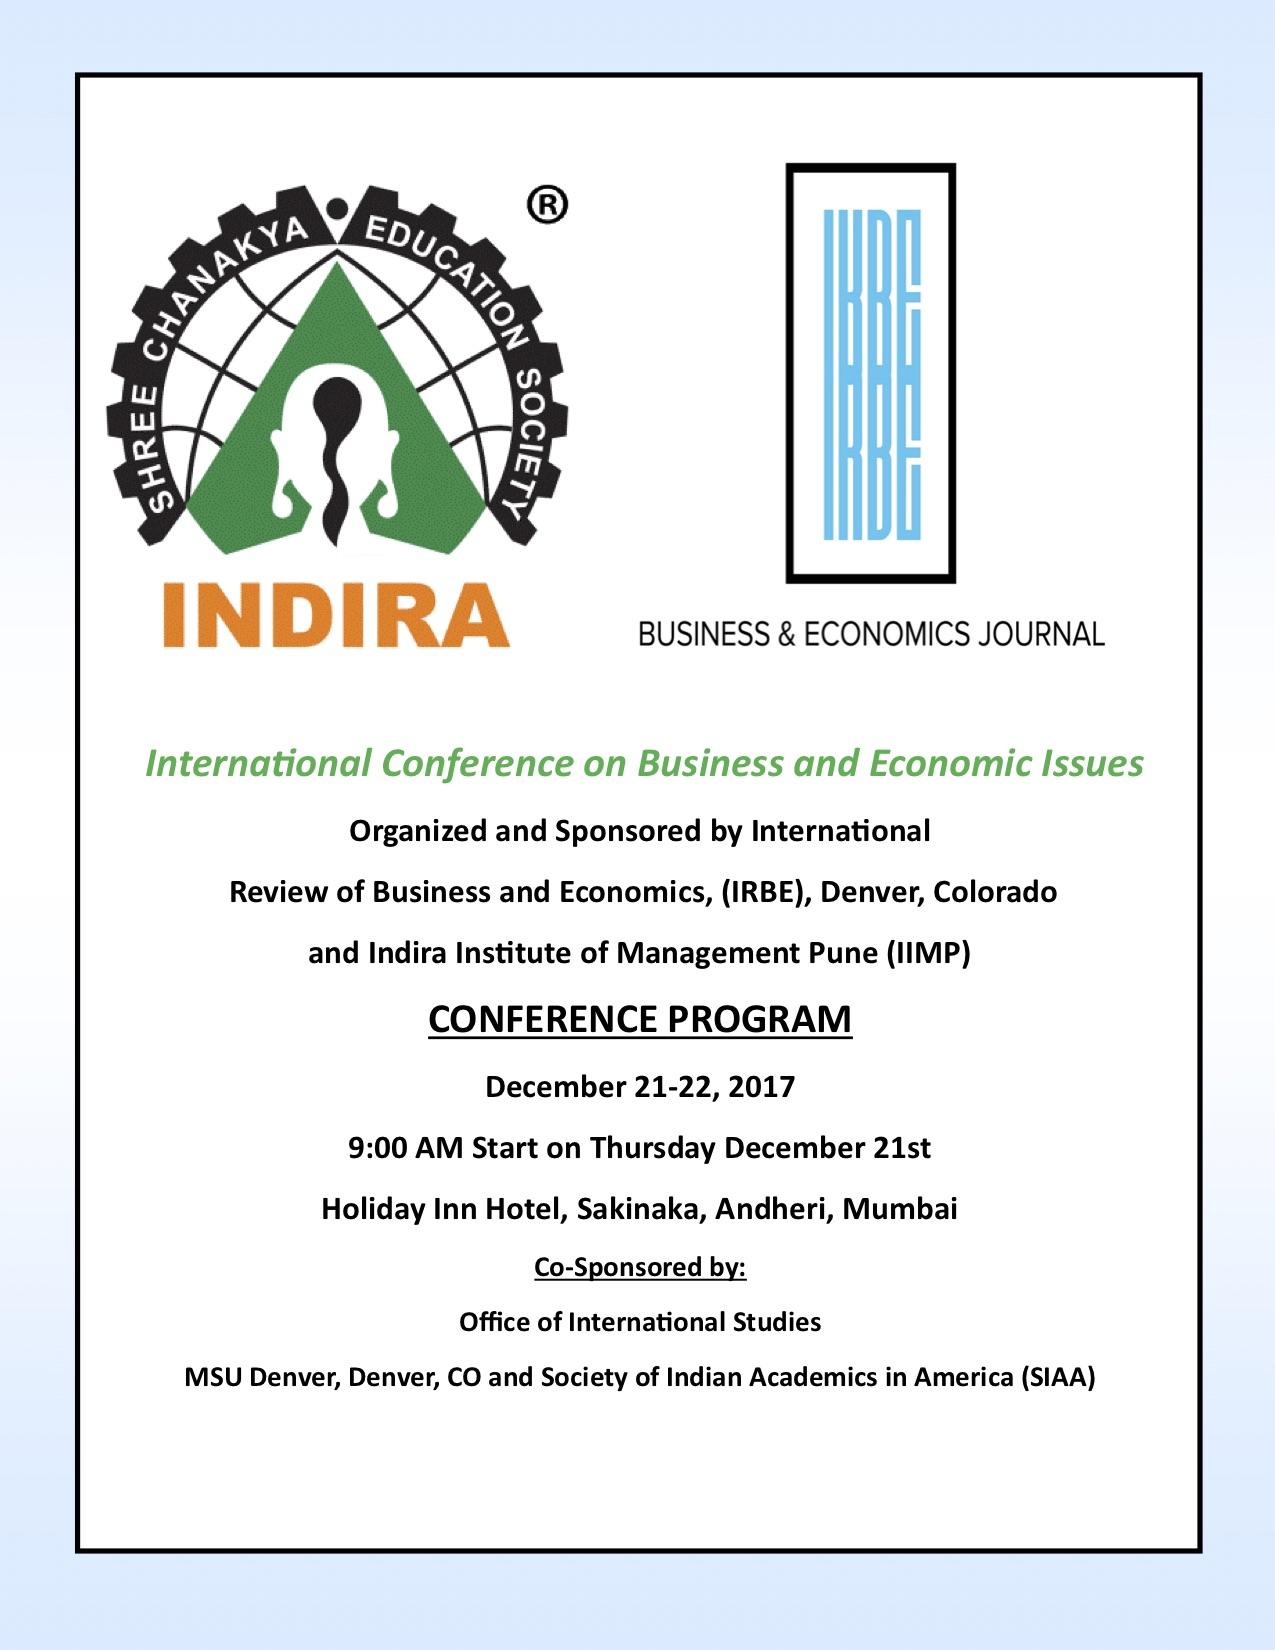 IRBE Conference Brochure.jpg